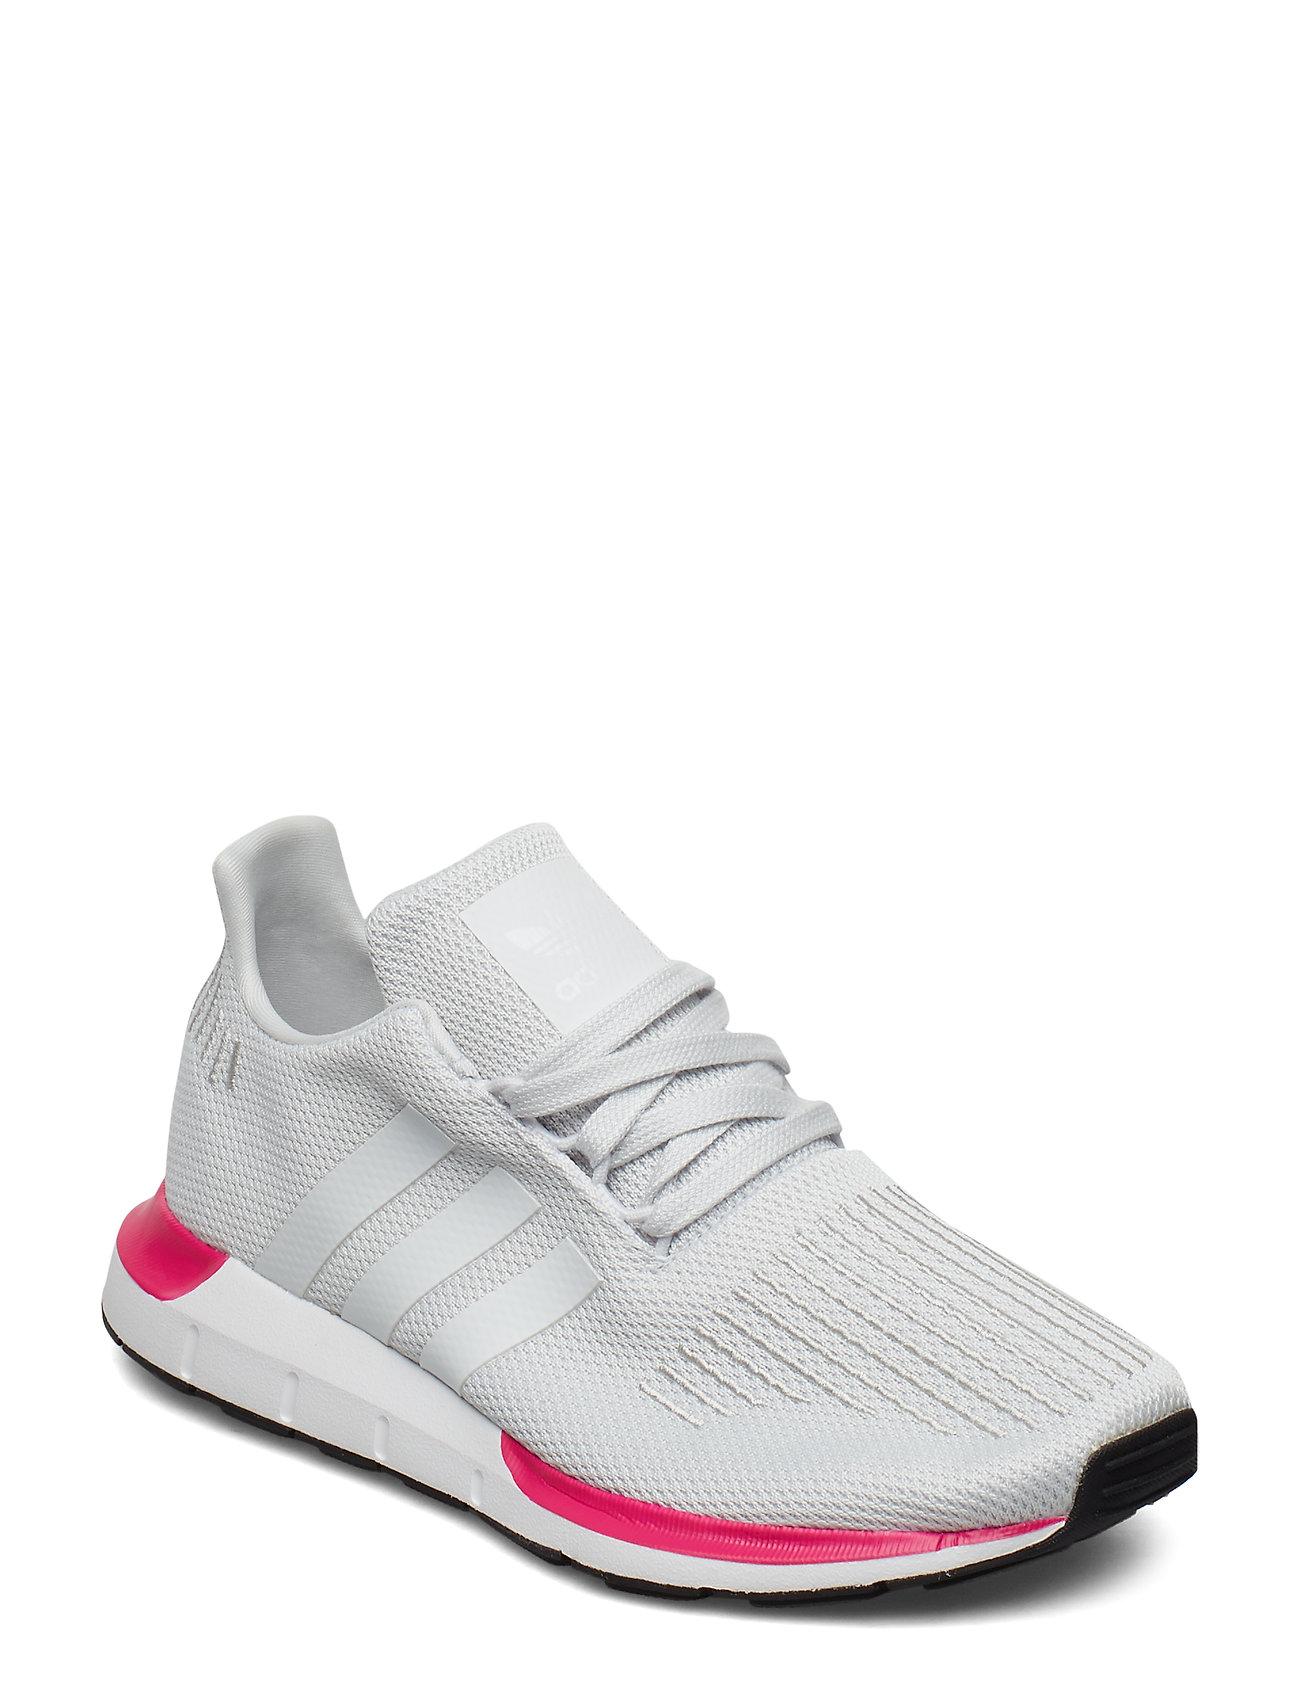 adidas Originals SWIFT RUN J - CRYWHT/CRYWHT/CBLACK